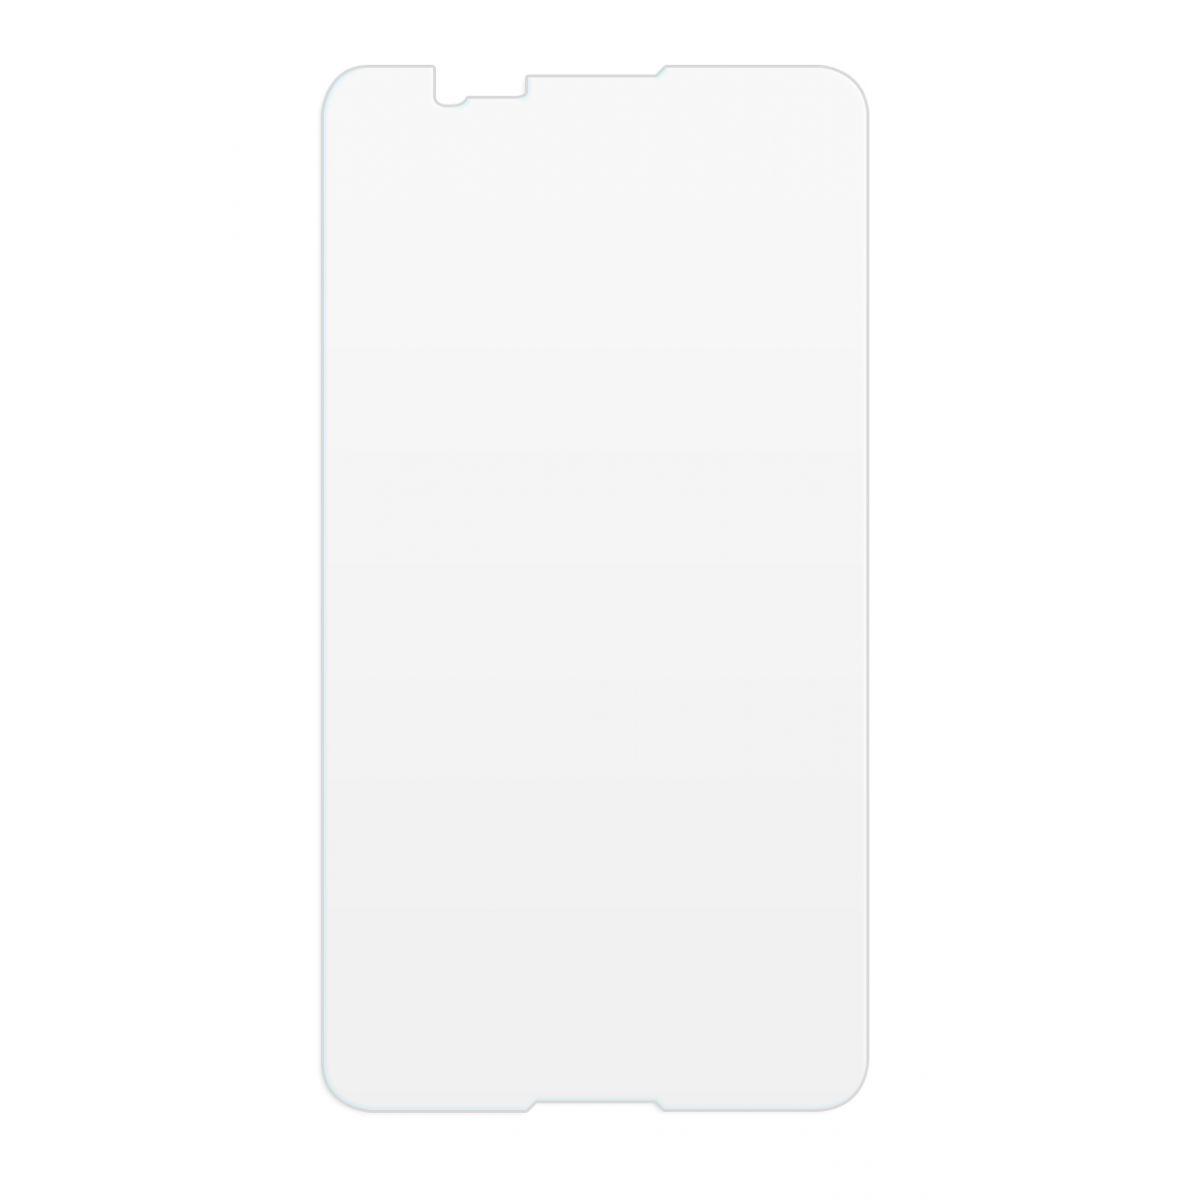 Película de Vidro para Sony Xperia E4 Aqua E2104